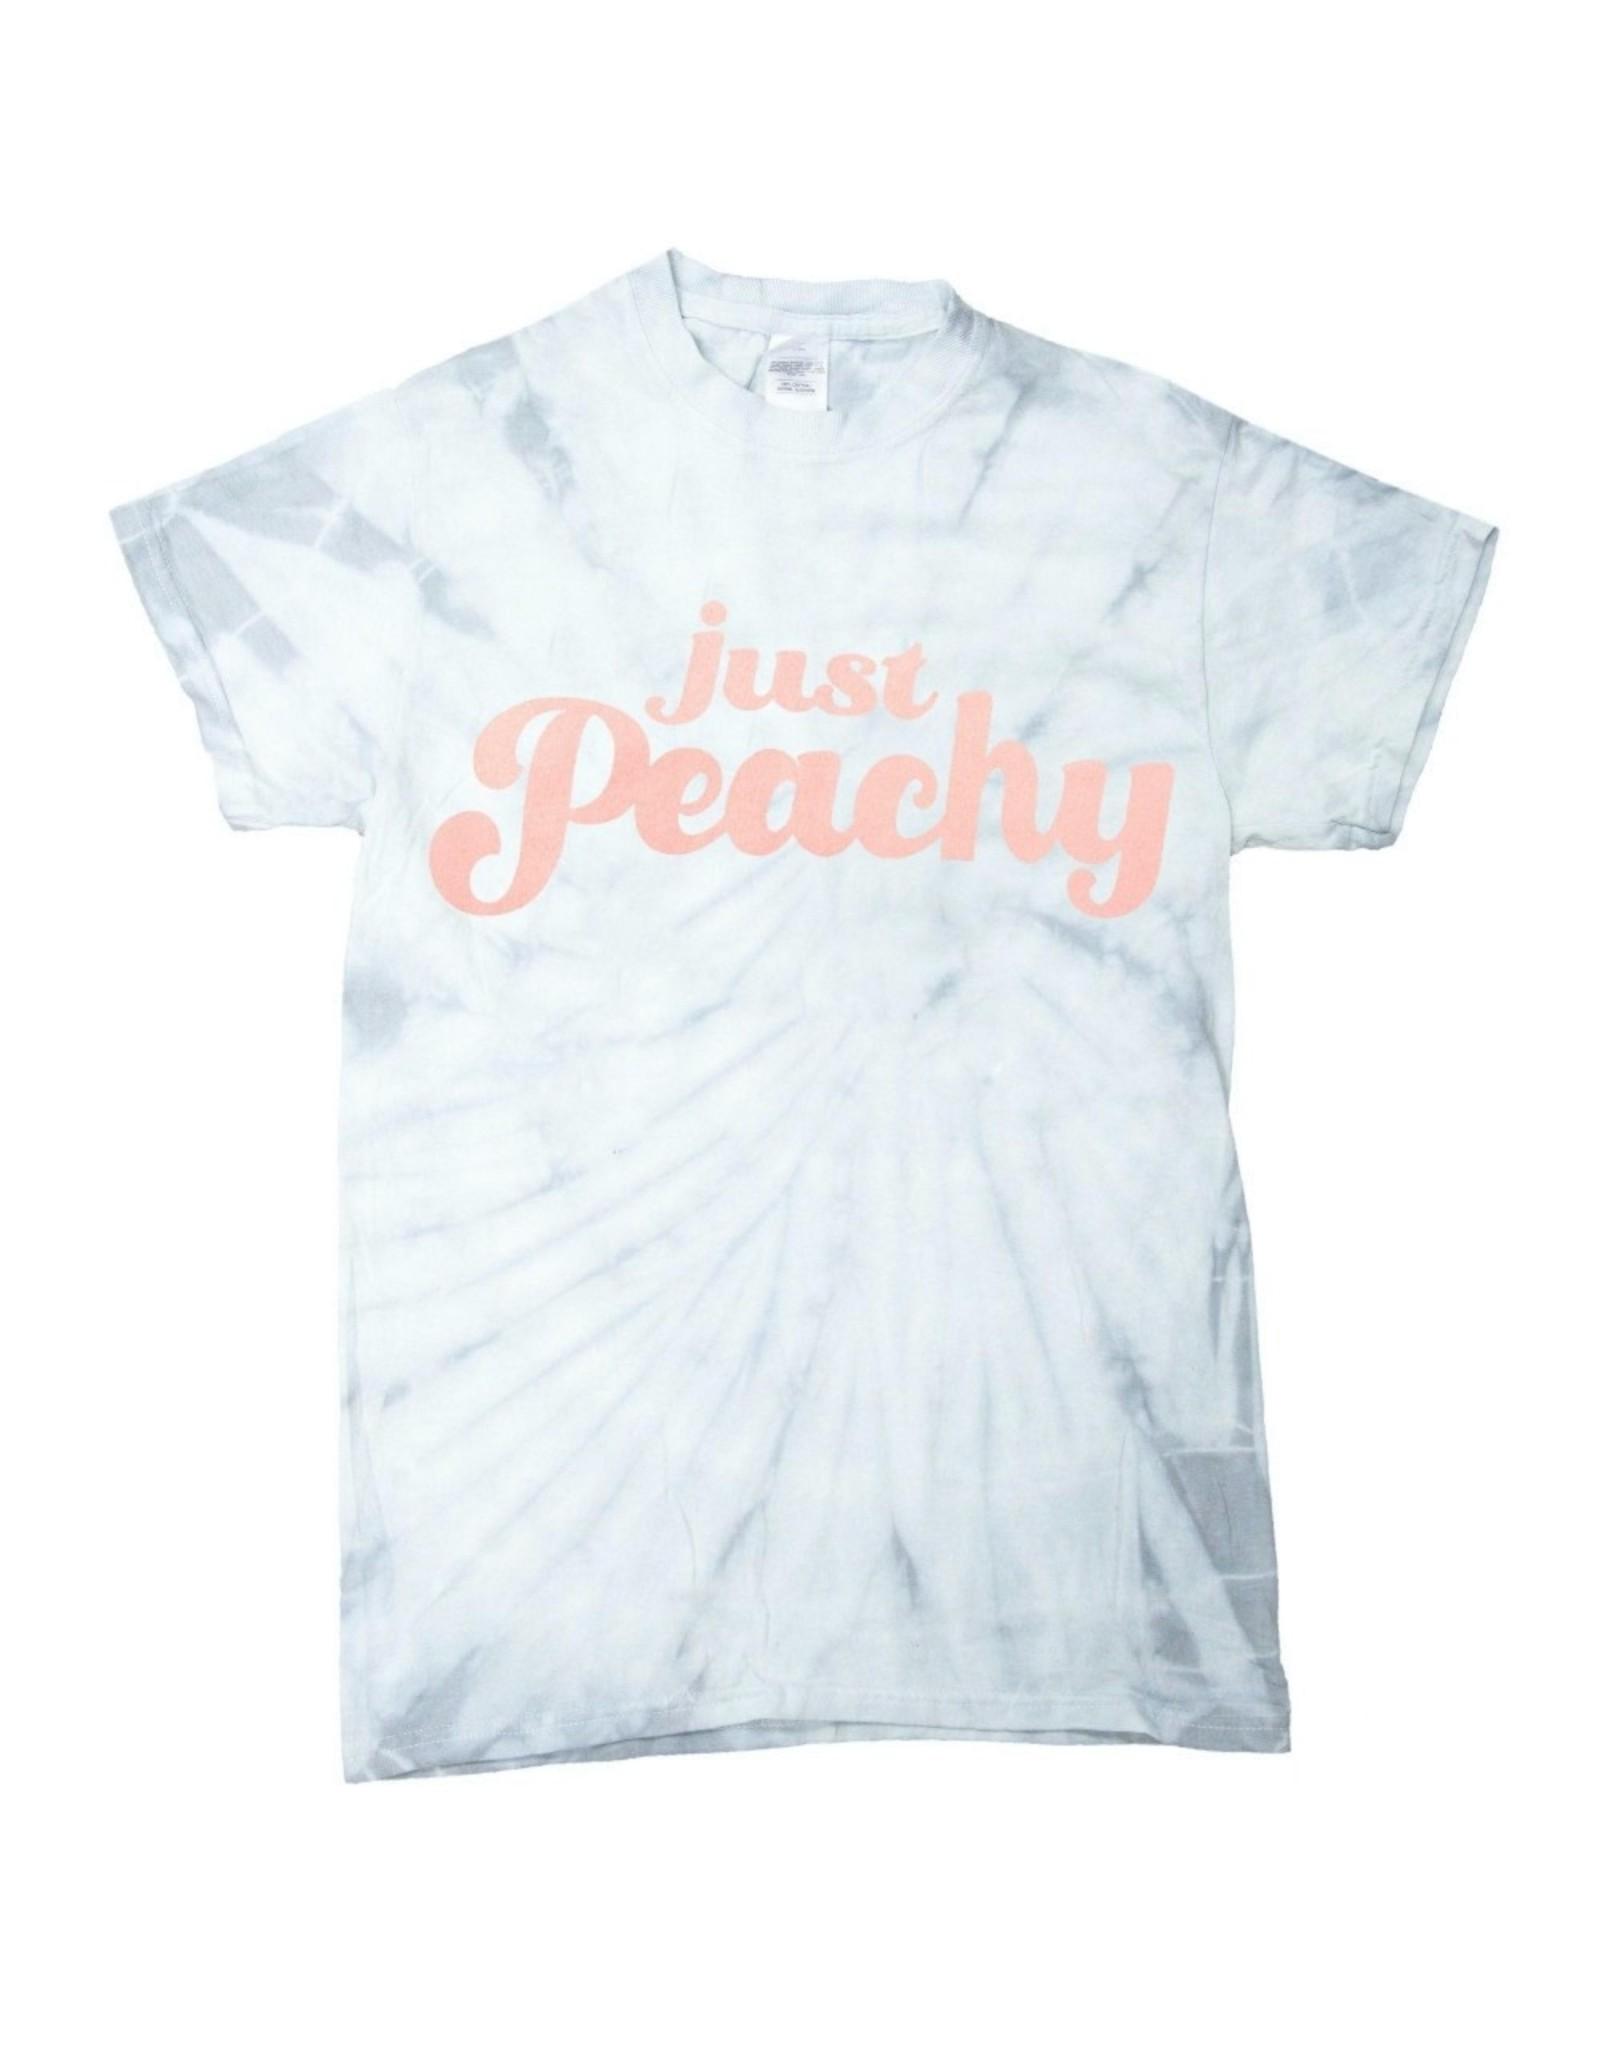 Just Peachy Tee